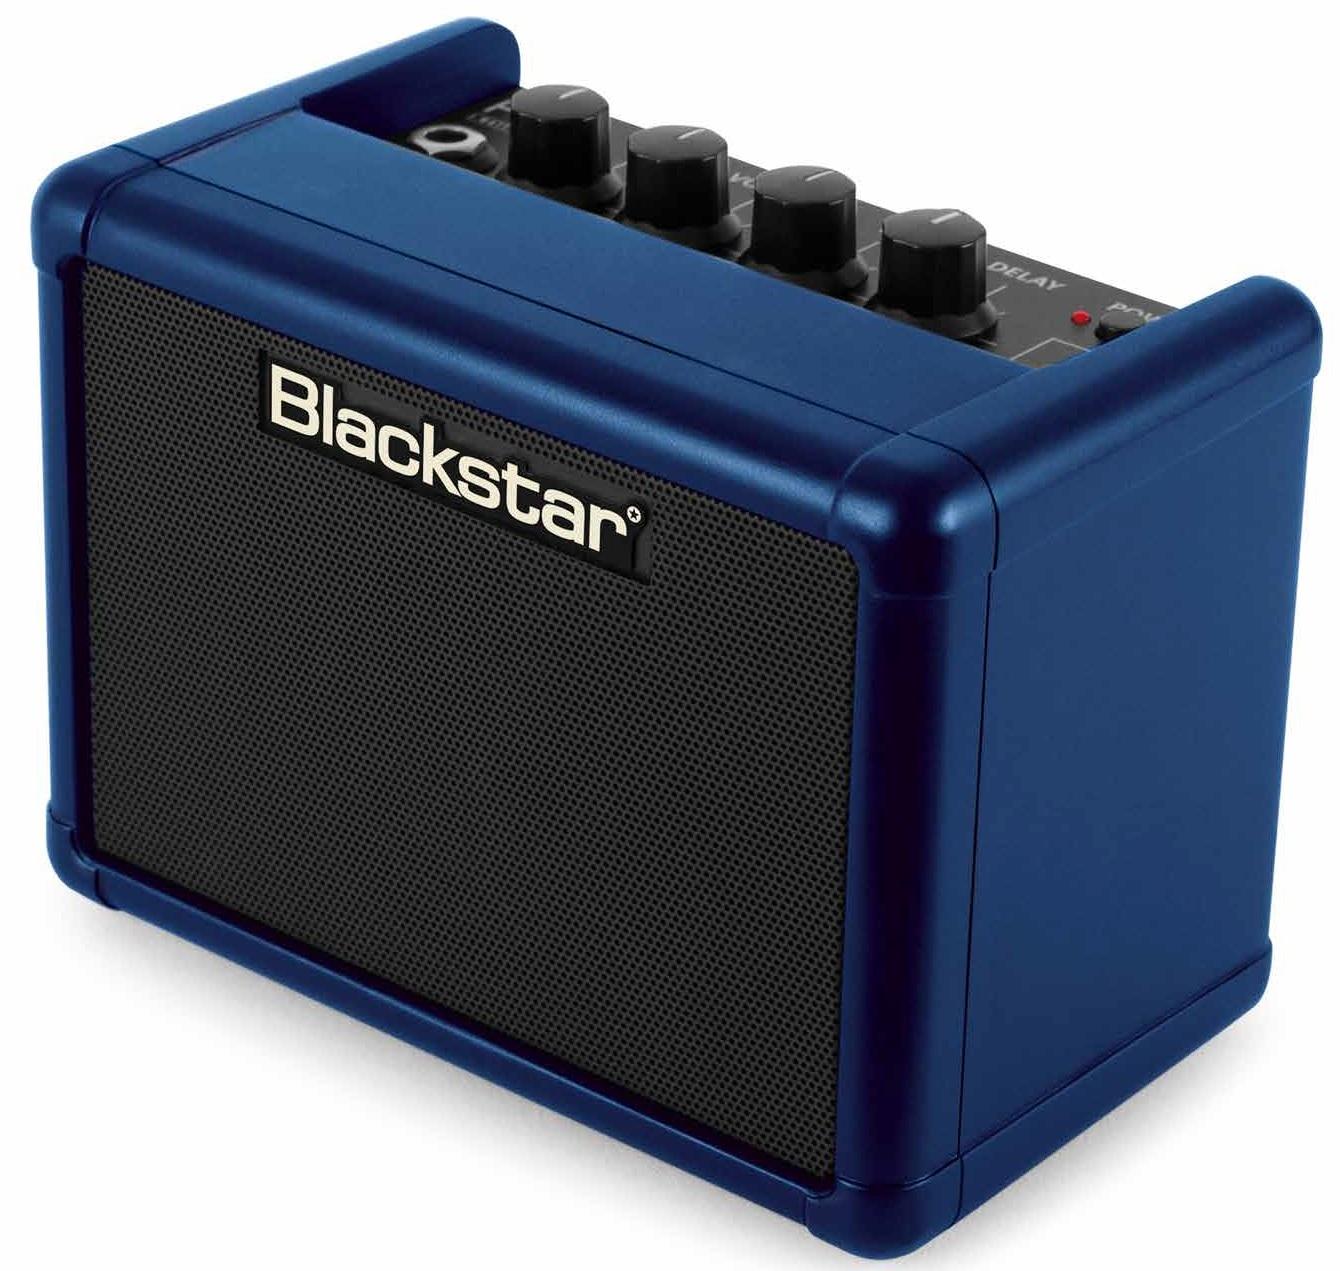 Blackstar FLY 3 Mini Amp Royal Blue Limited Edition